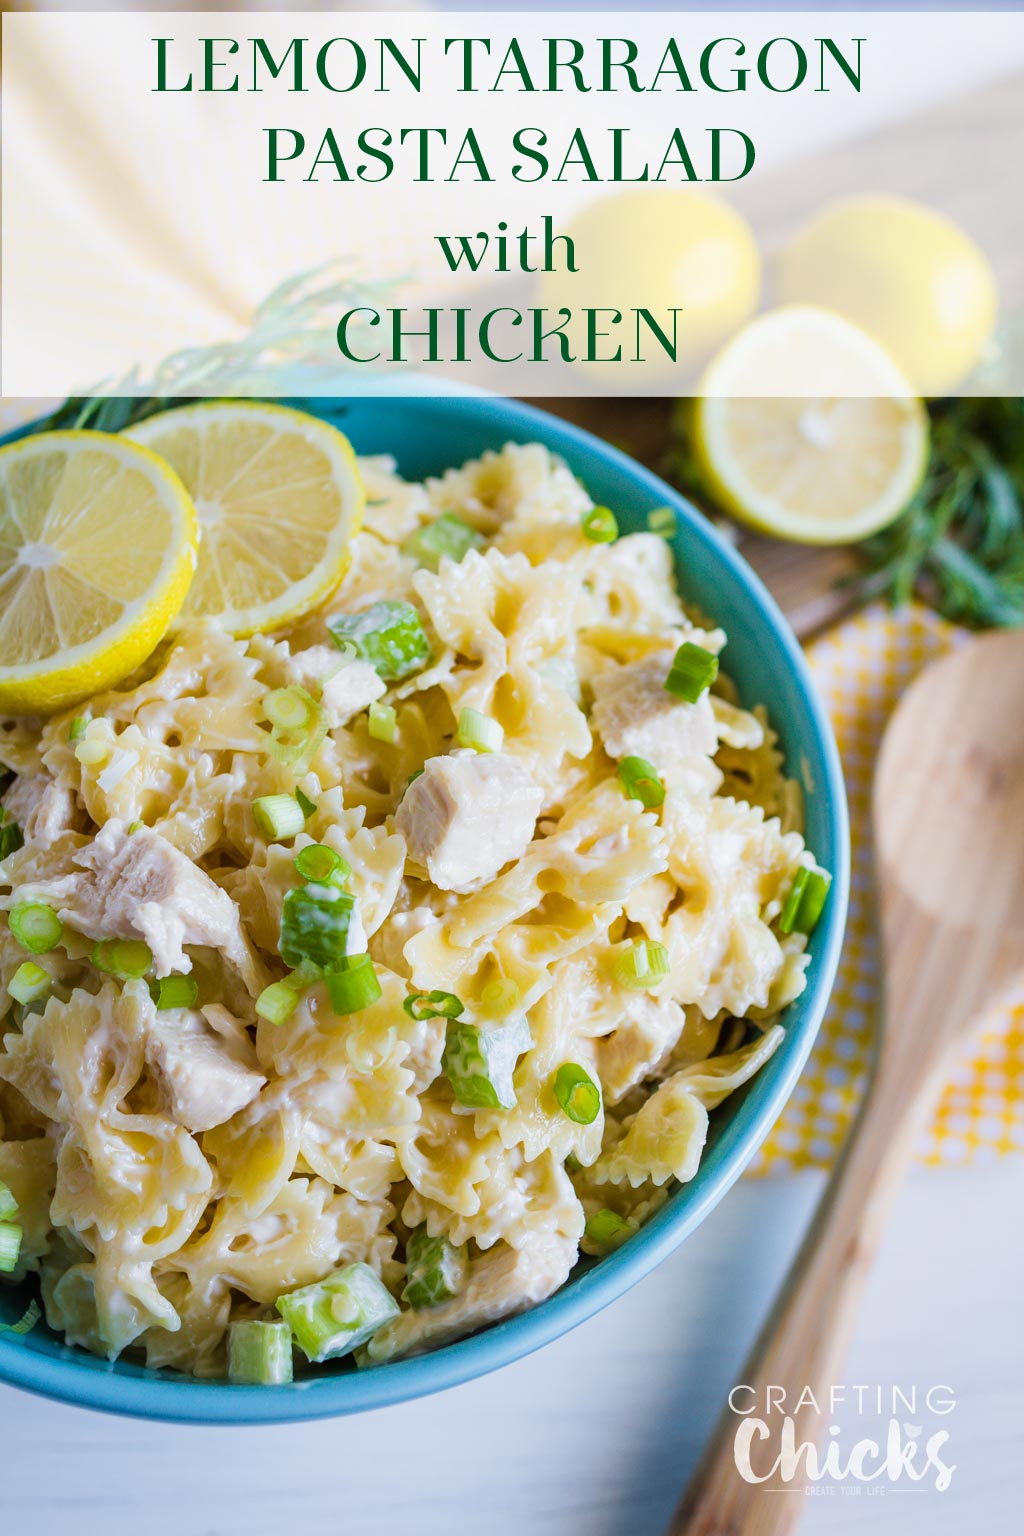 Lemon Tarragon Pasta Salad with Chicken